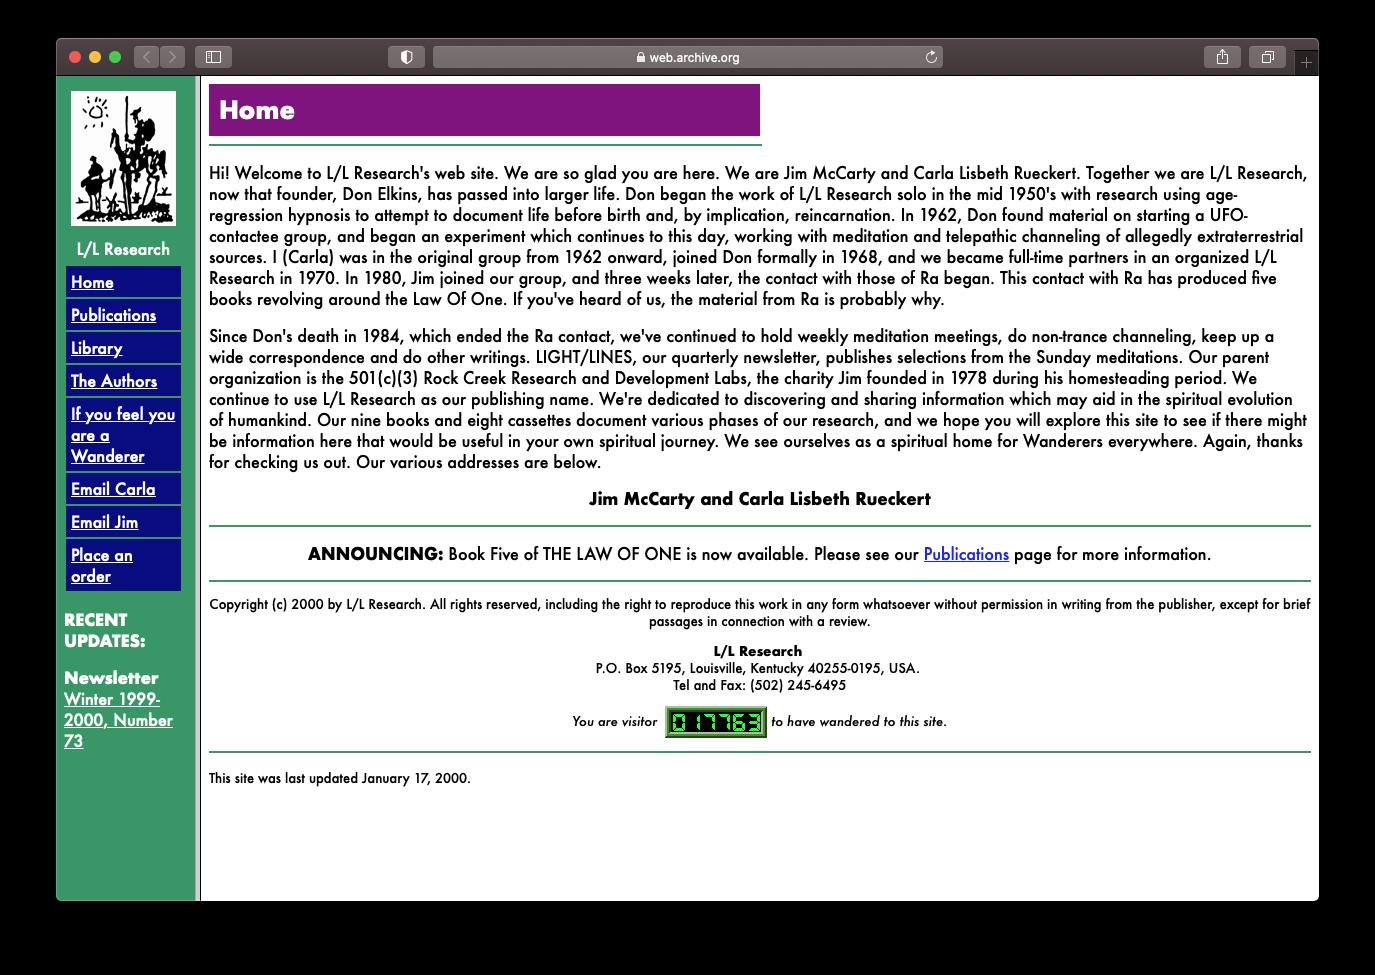 LLResearch.org - 2000